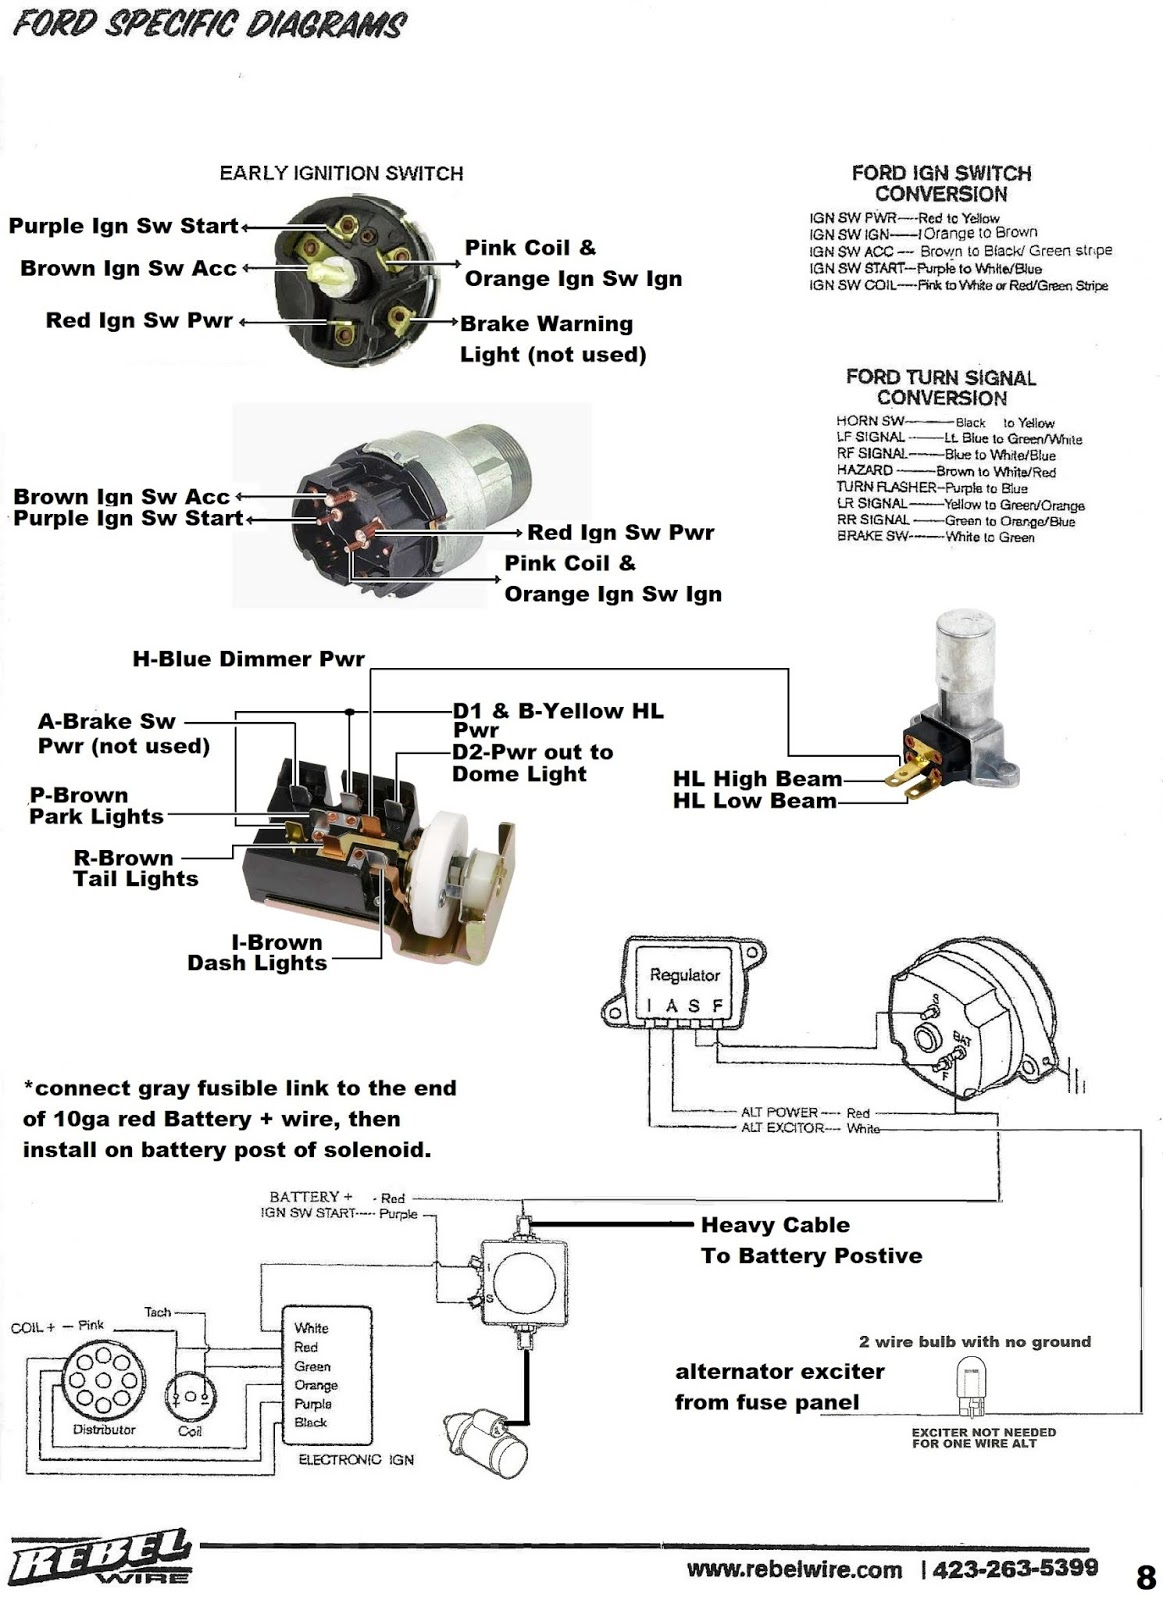 ford wiring diagrams  [ 1163 x 1600 Pixel ]